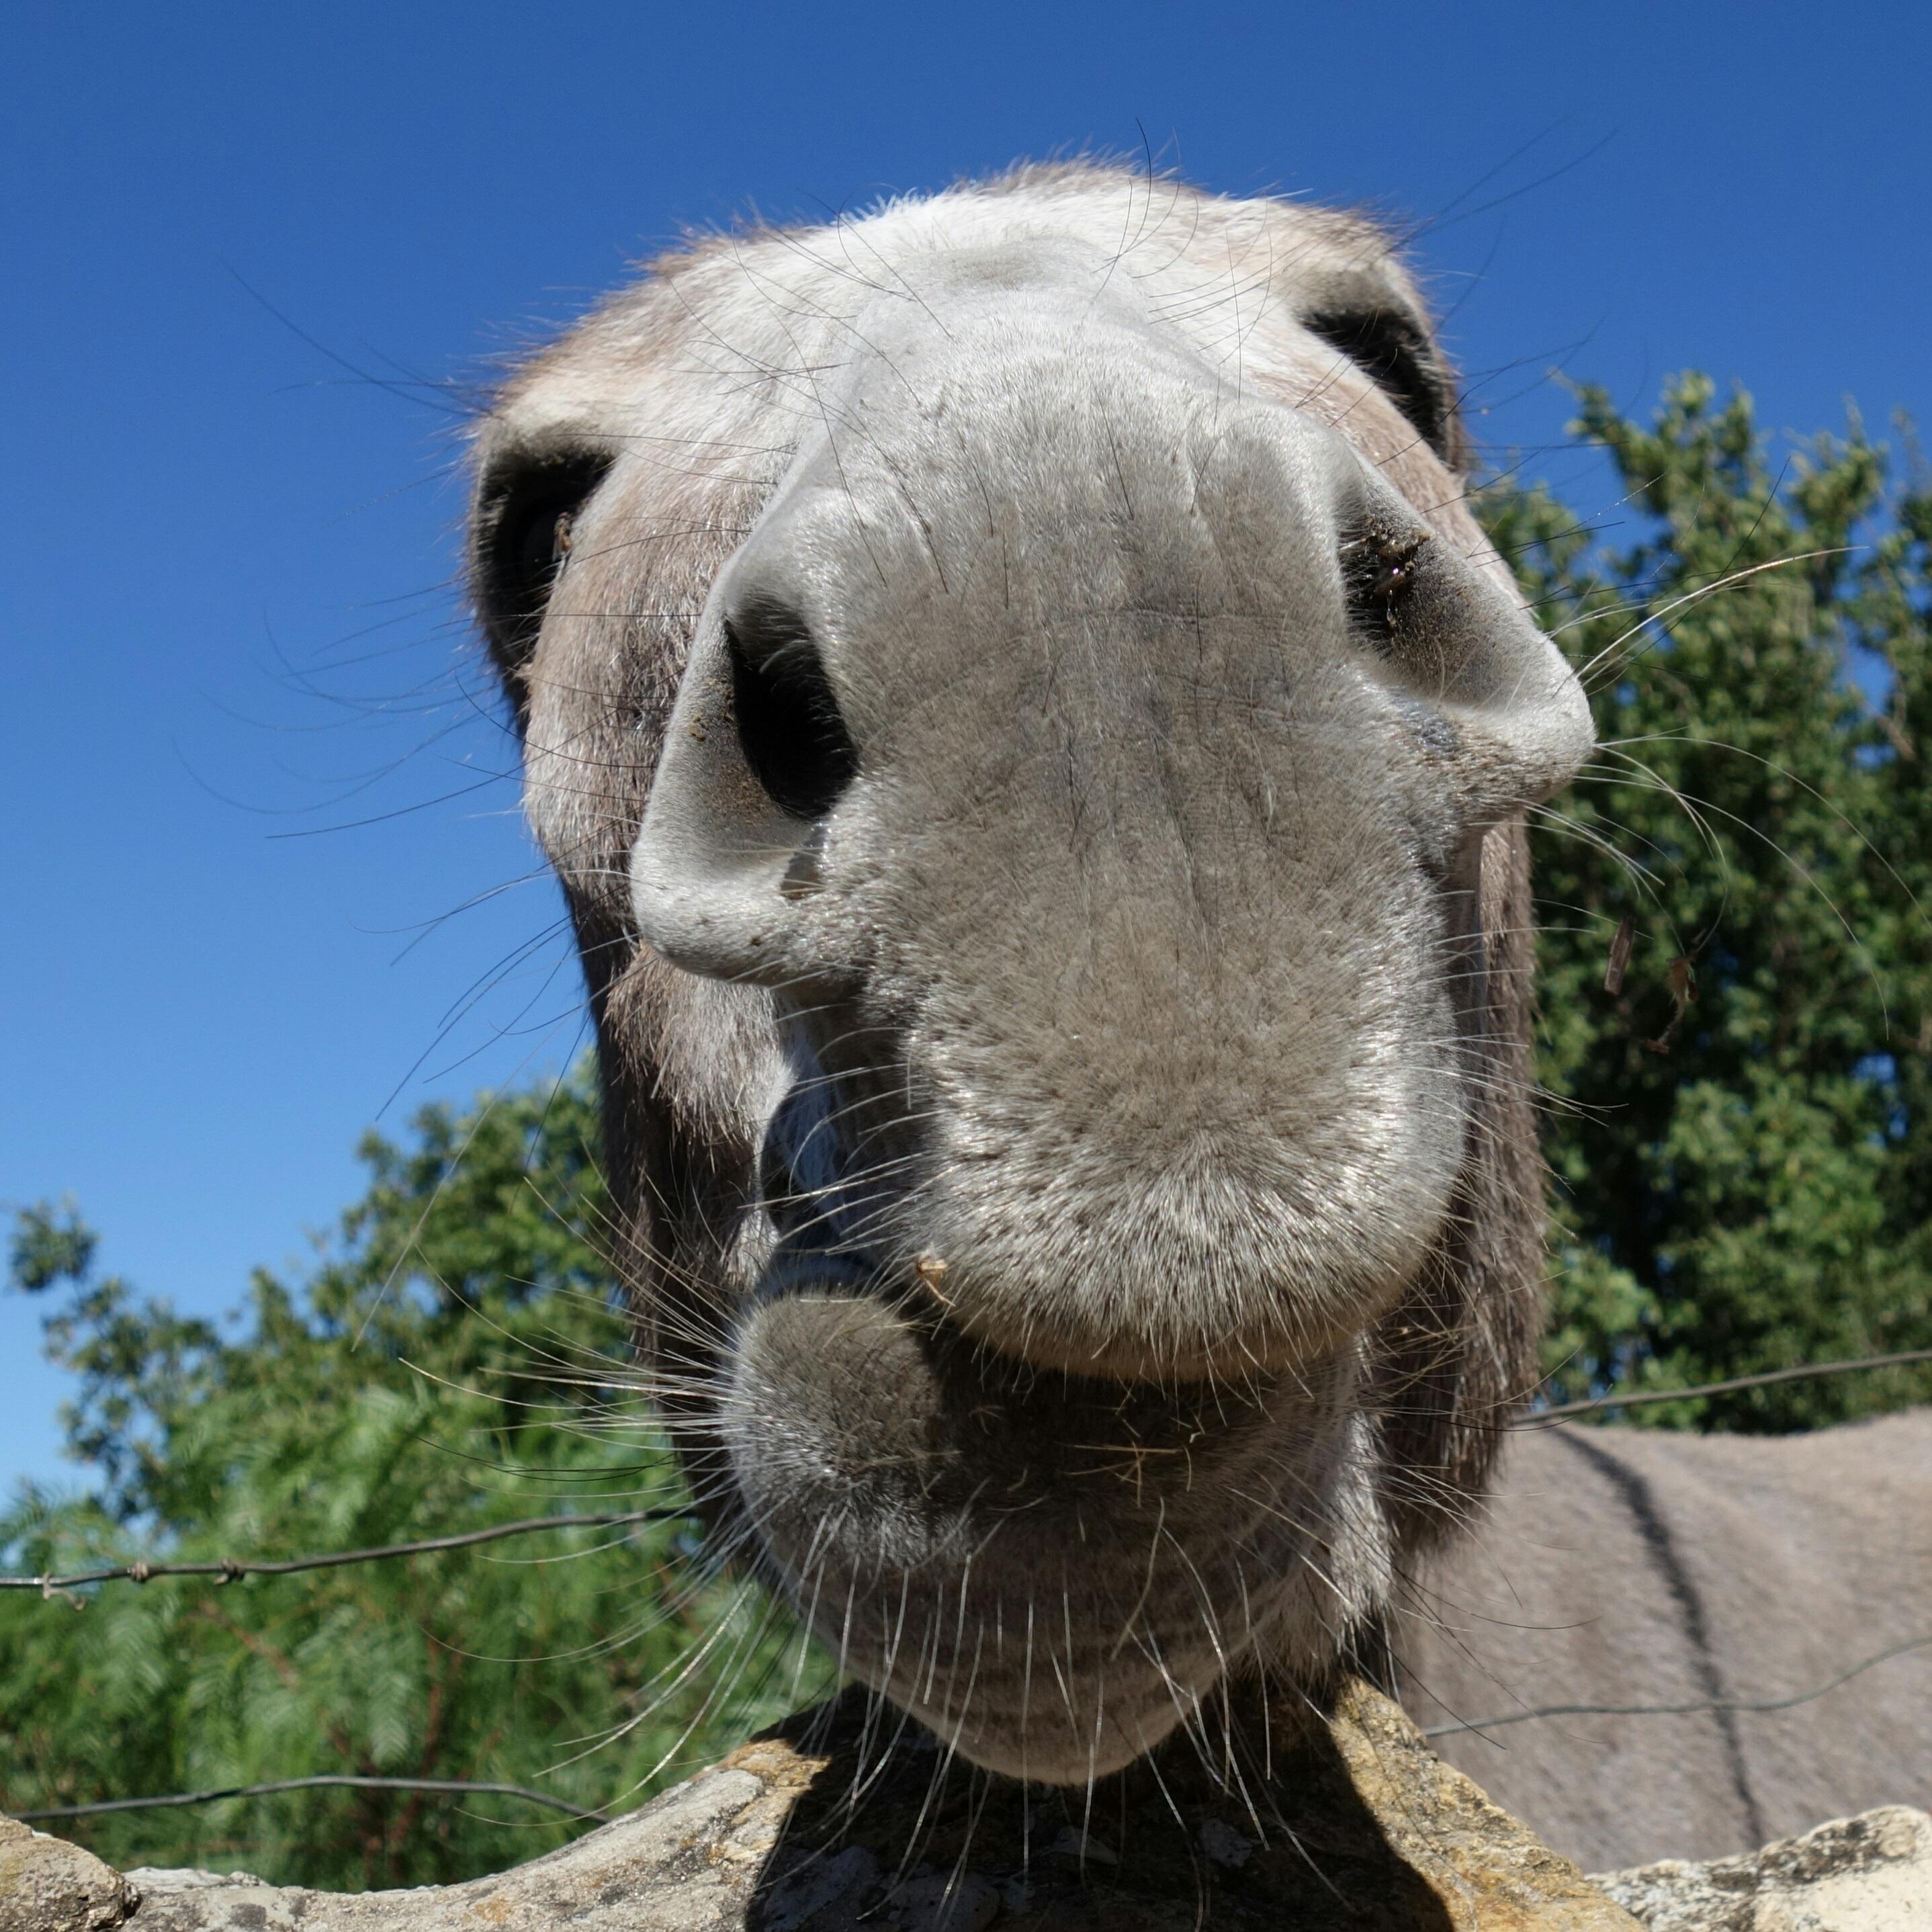 animal mascota camello mamífero melena cerca fauna llama Burro nariz hocico  vertebrado Camello como mamífero Caballo 10cddf95c9f